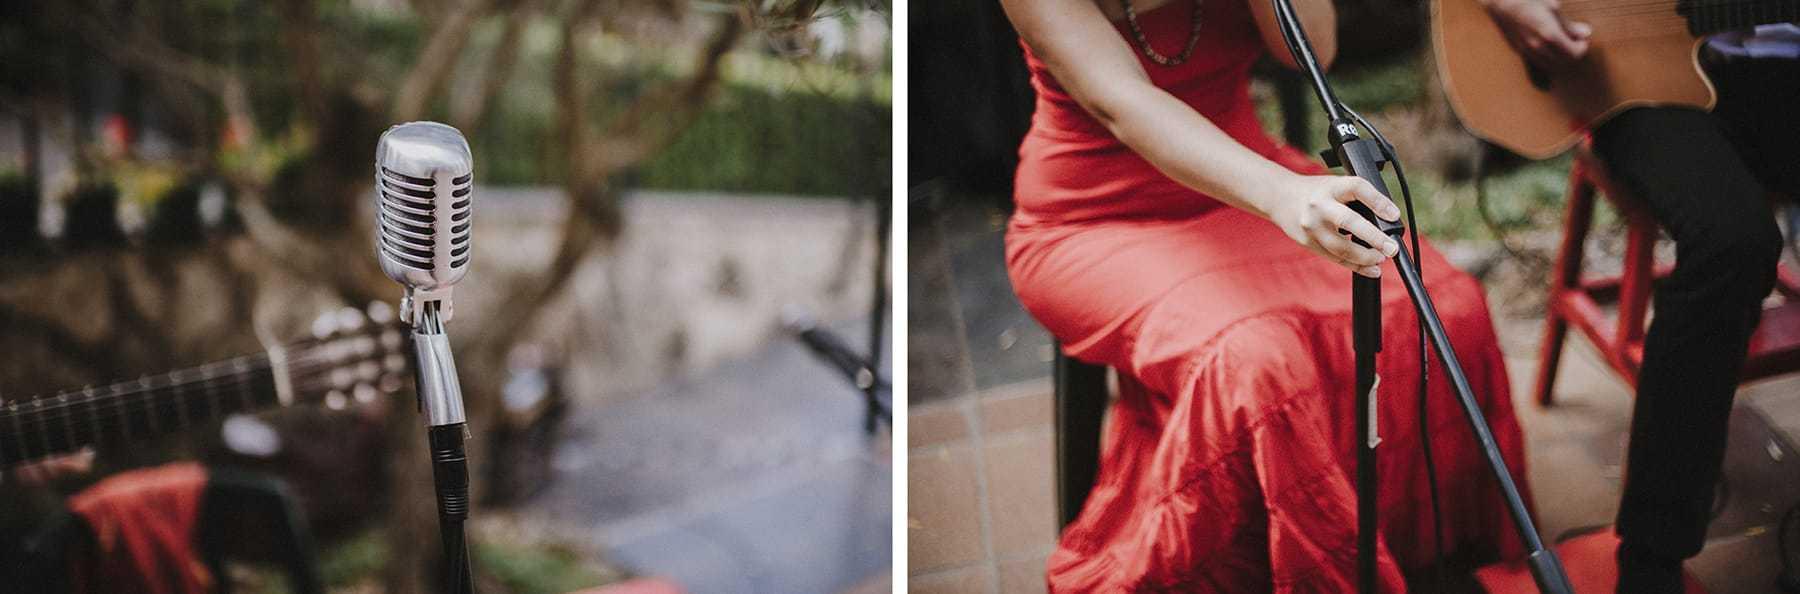 hilario_sanchez_fotografo_boda_moderno_madrid_023